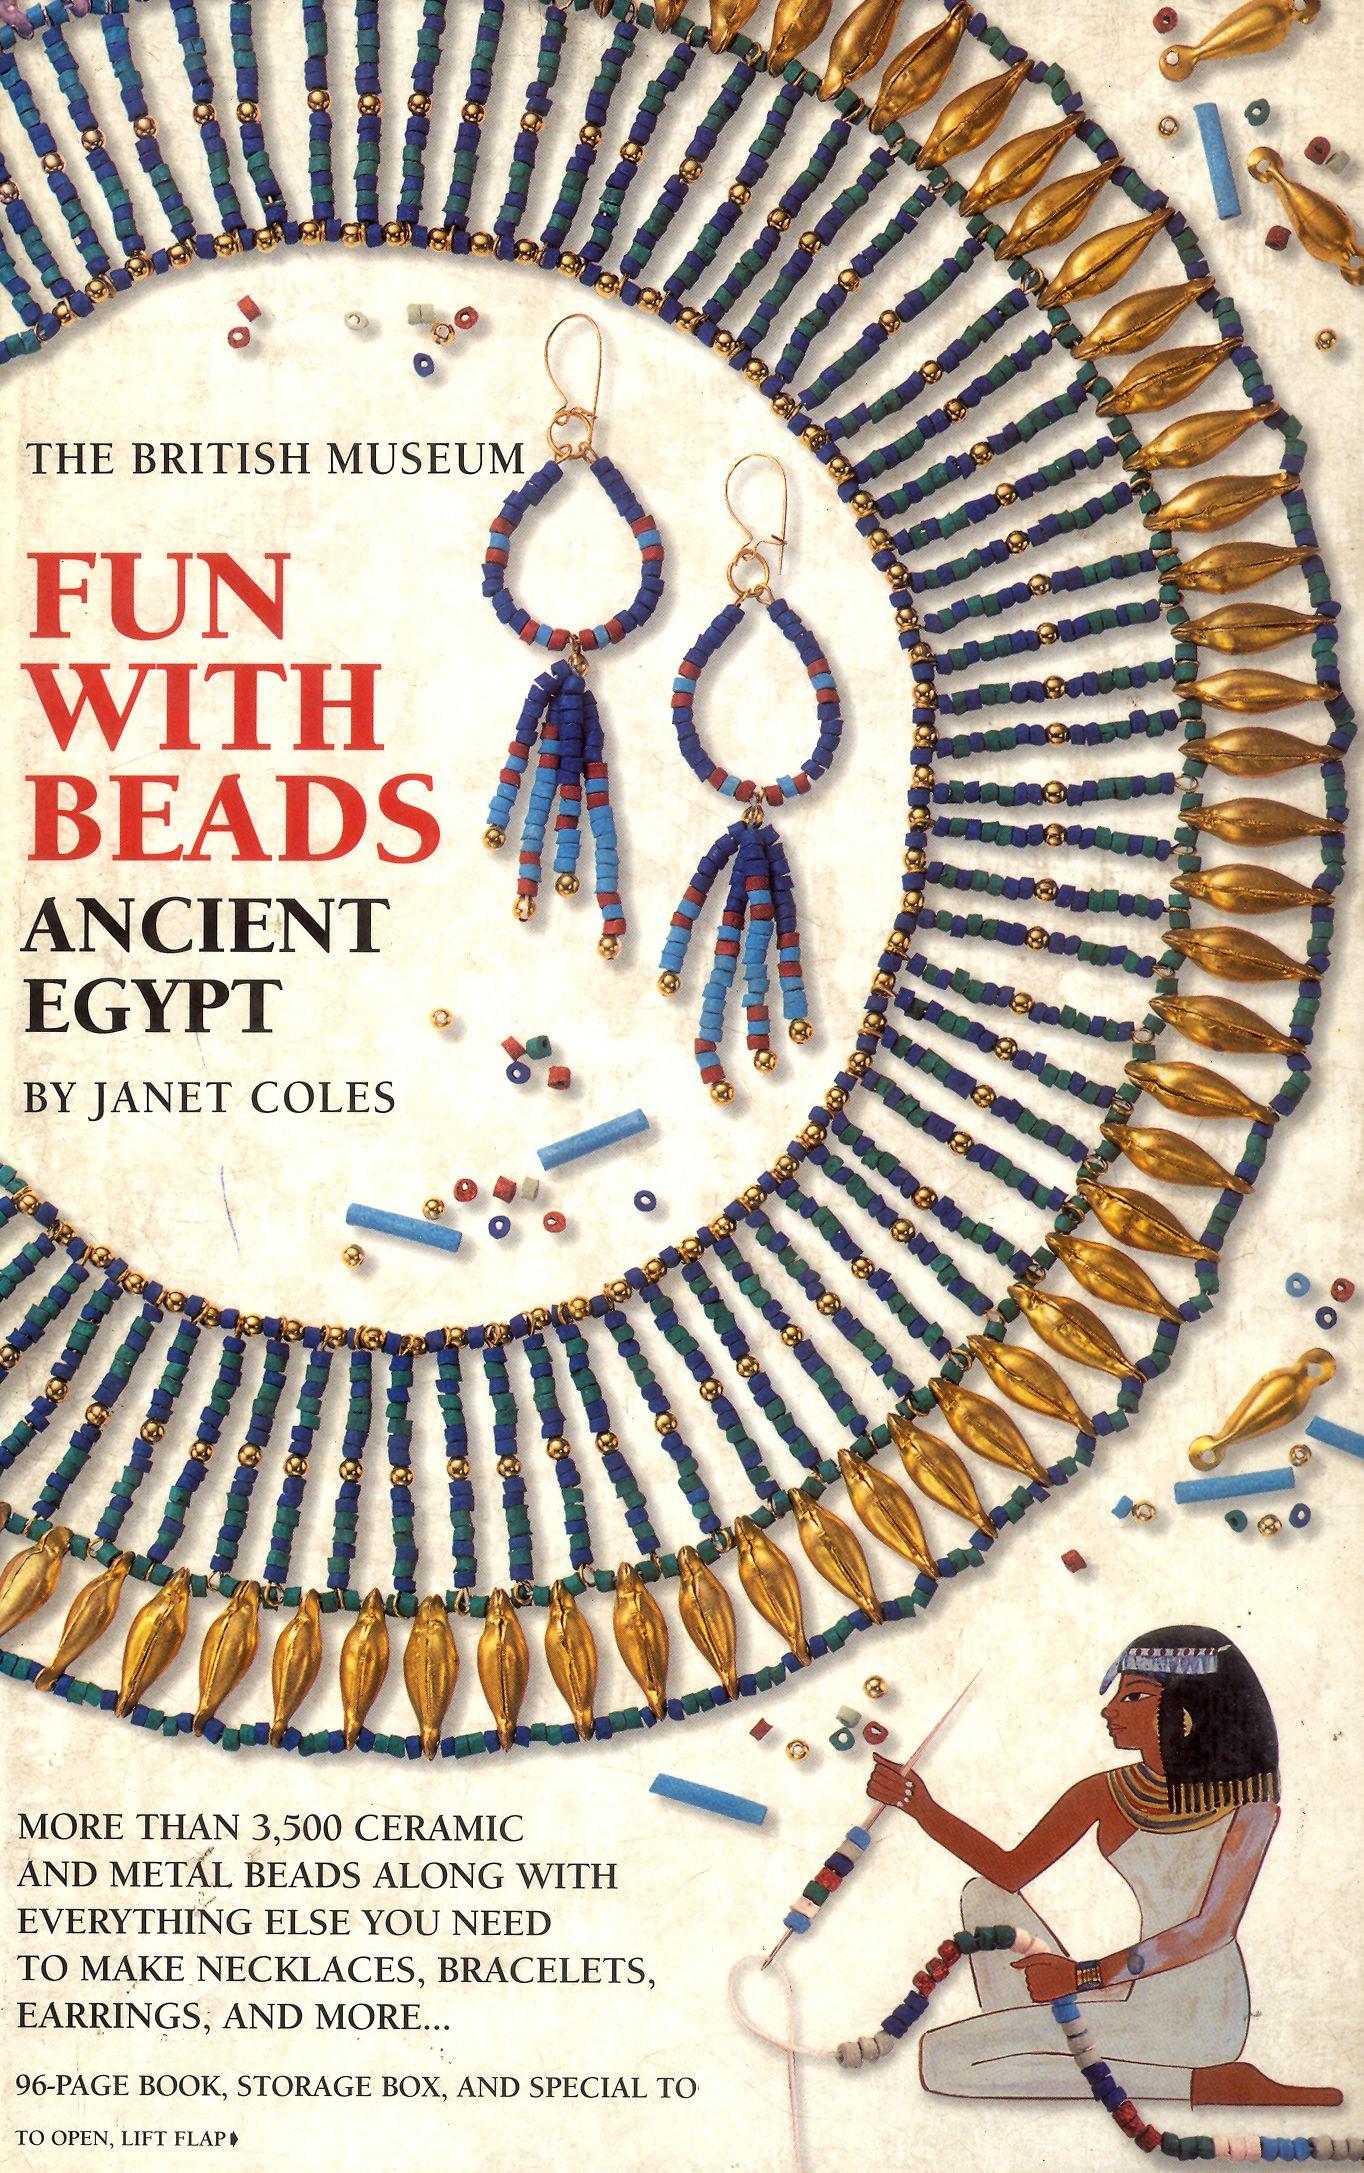 jewellery booksjewellery designbest book for beads making